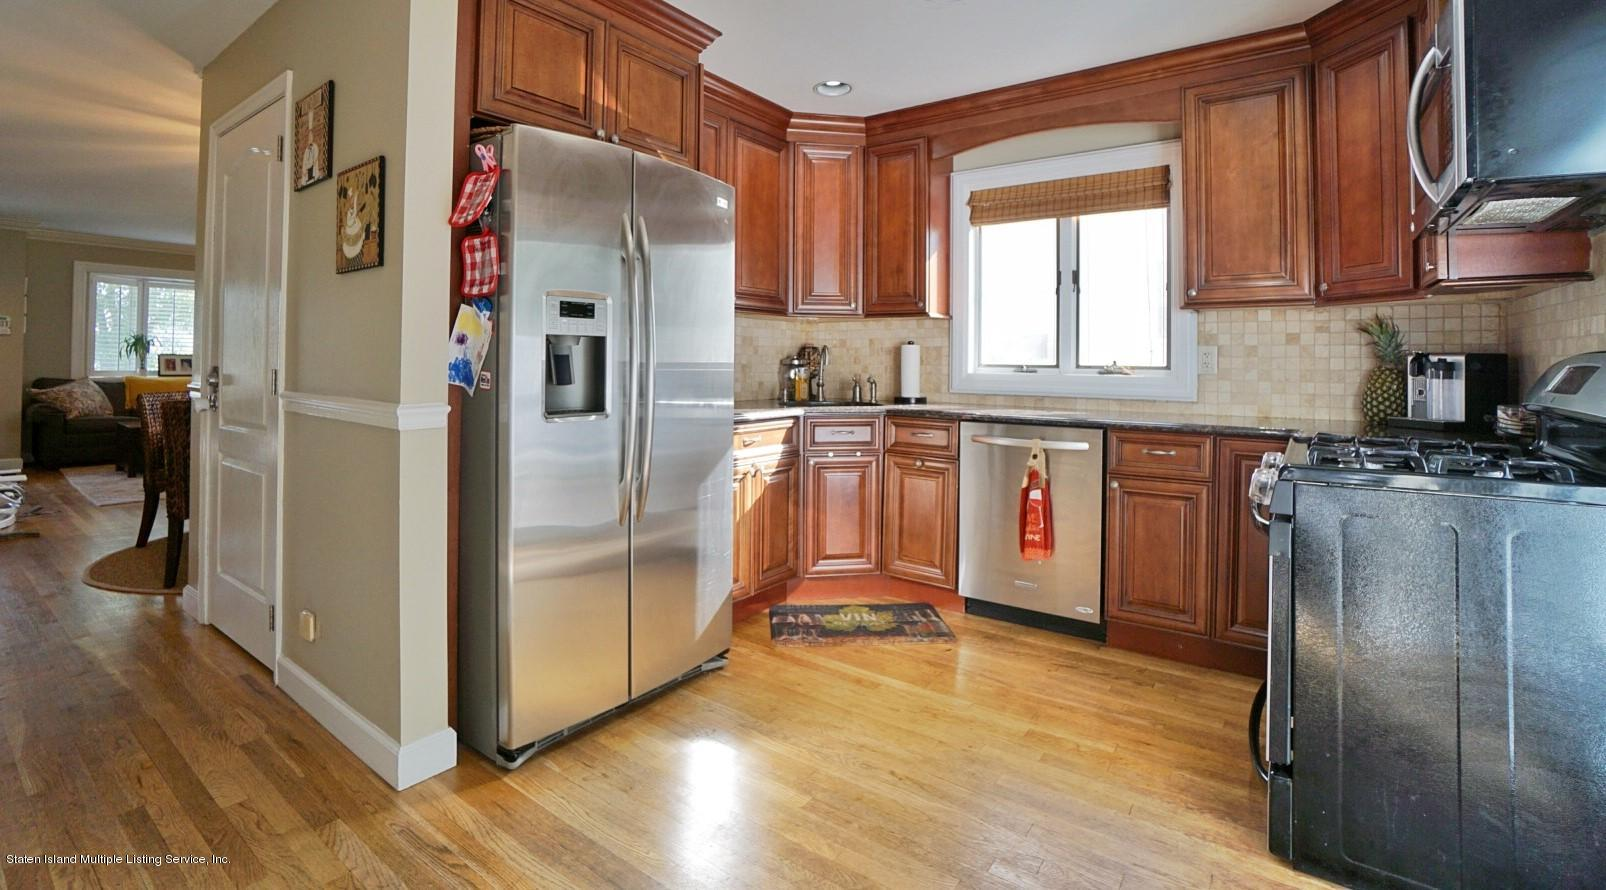 Single Family - Semi-Attached 66 Reading Avenue  Staten Island, NY 10312, MLS-1132256-6